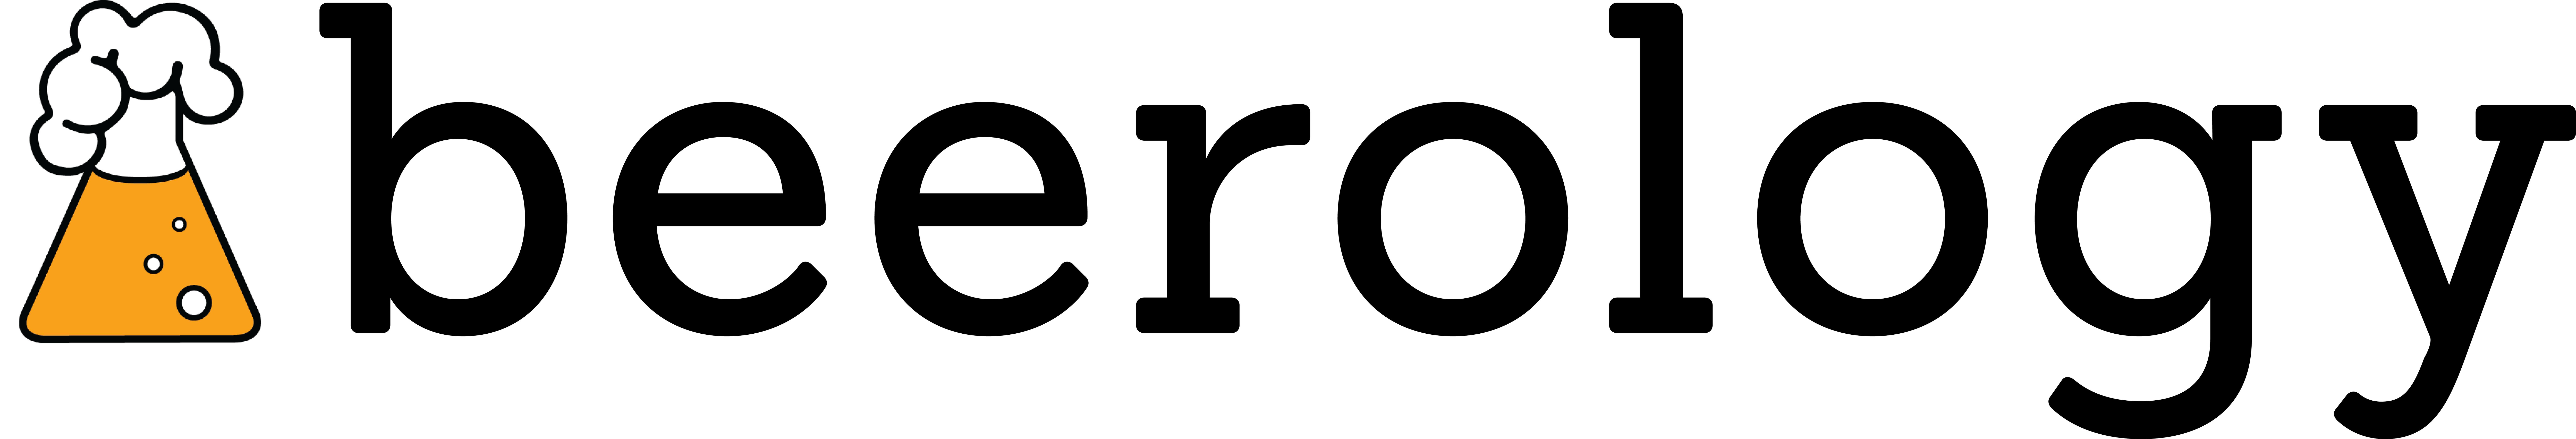 Beerology logo